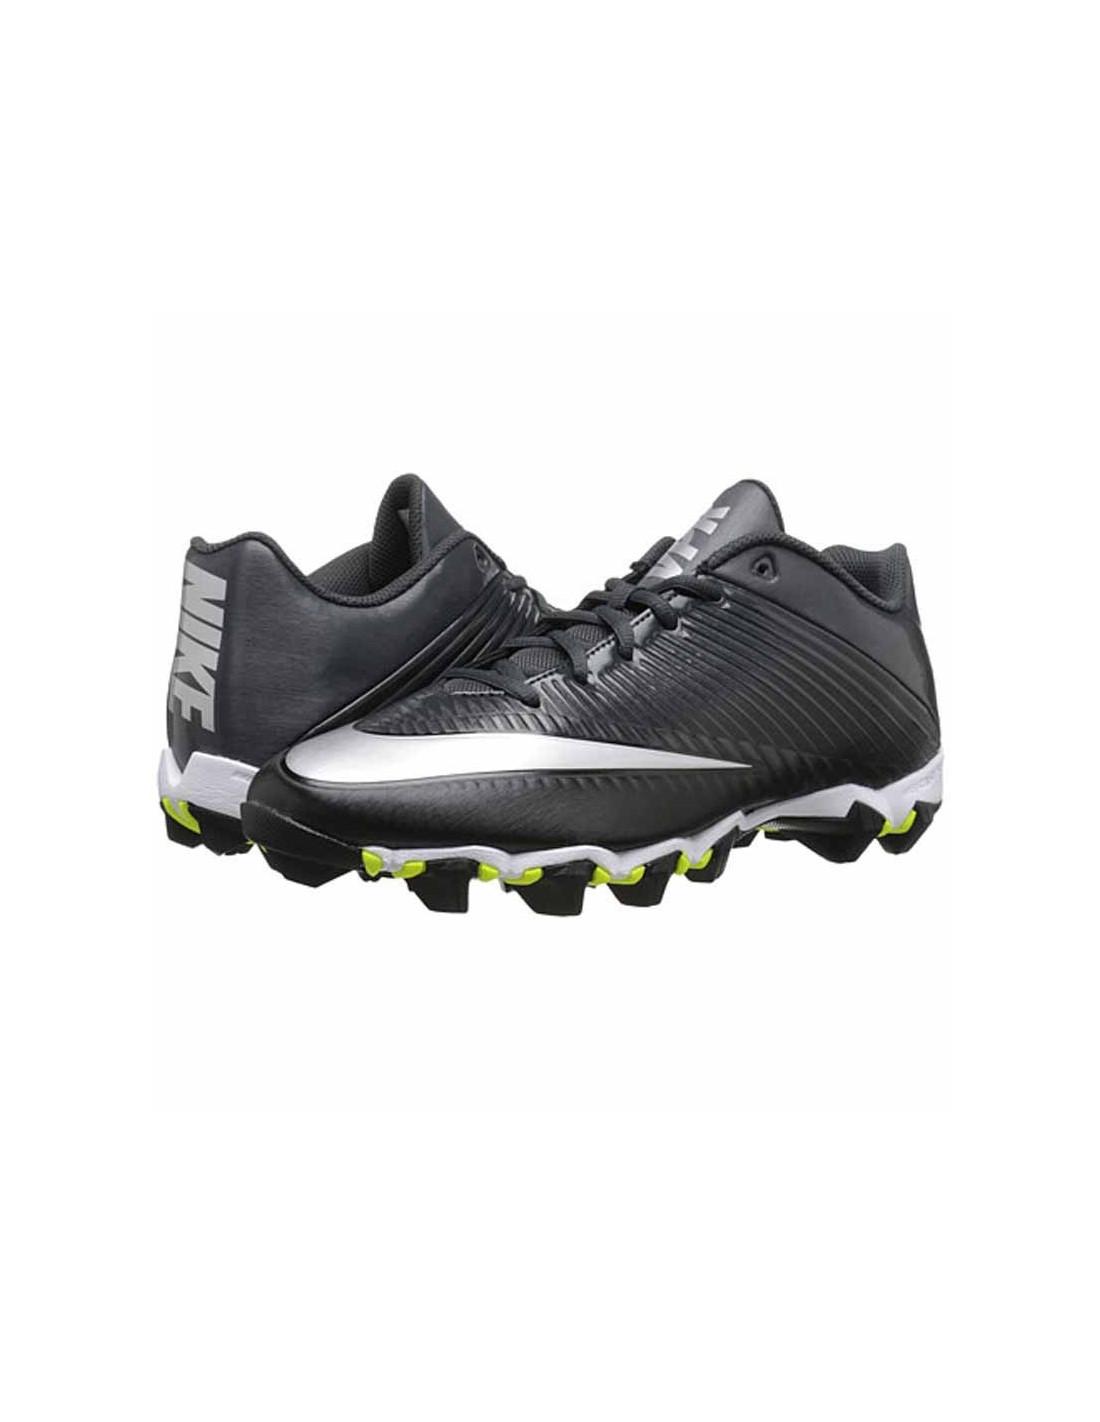 new product 394ac 3d271 Nike Vapor Shark Football Cleats Buty Futbolowe ...